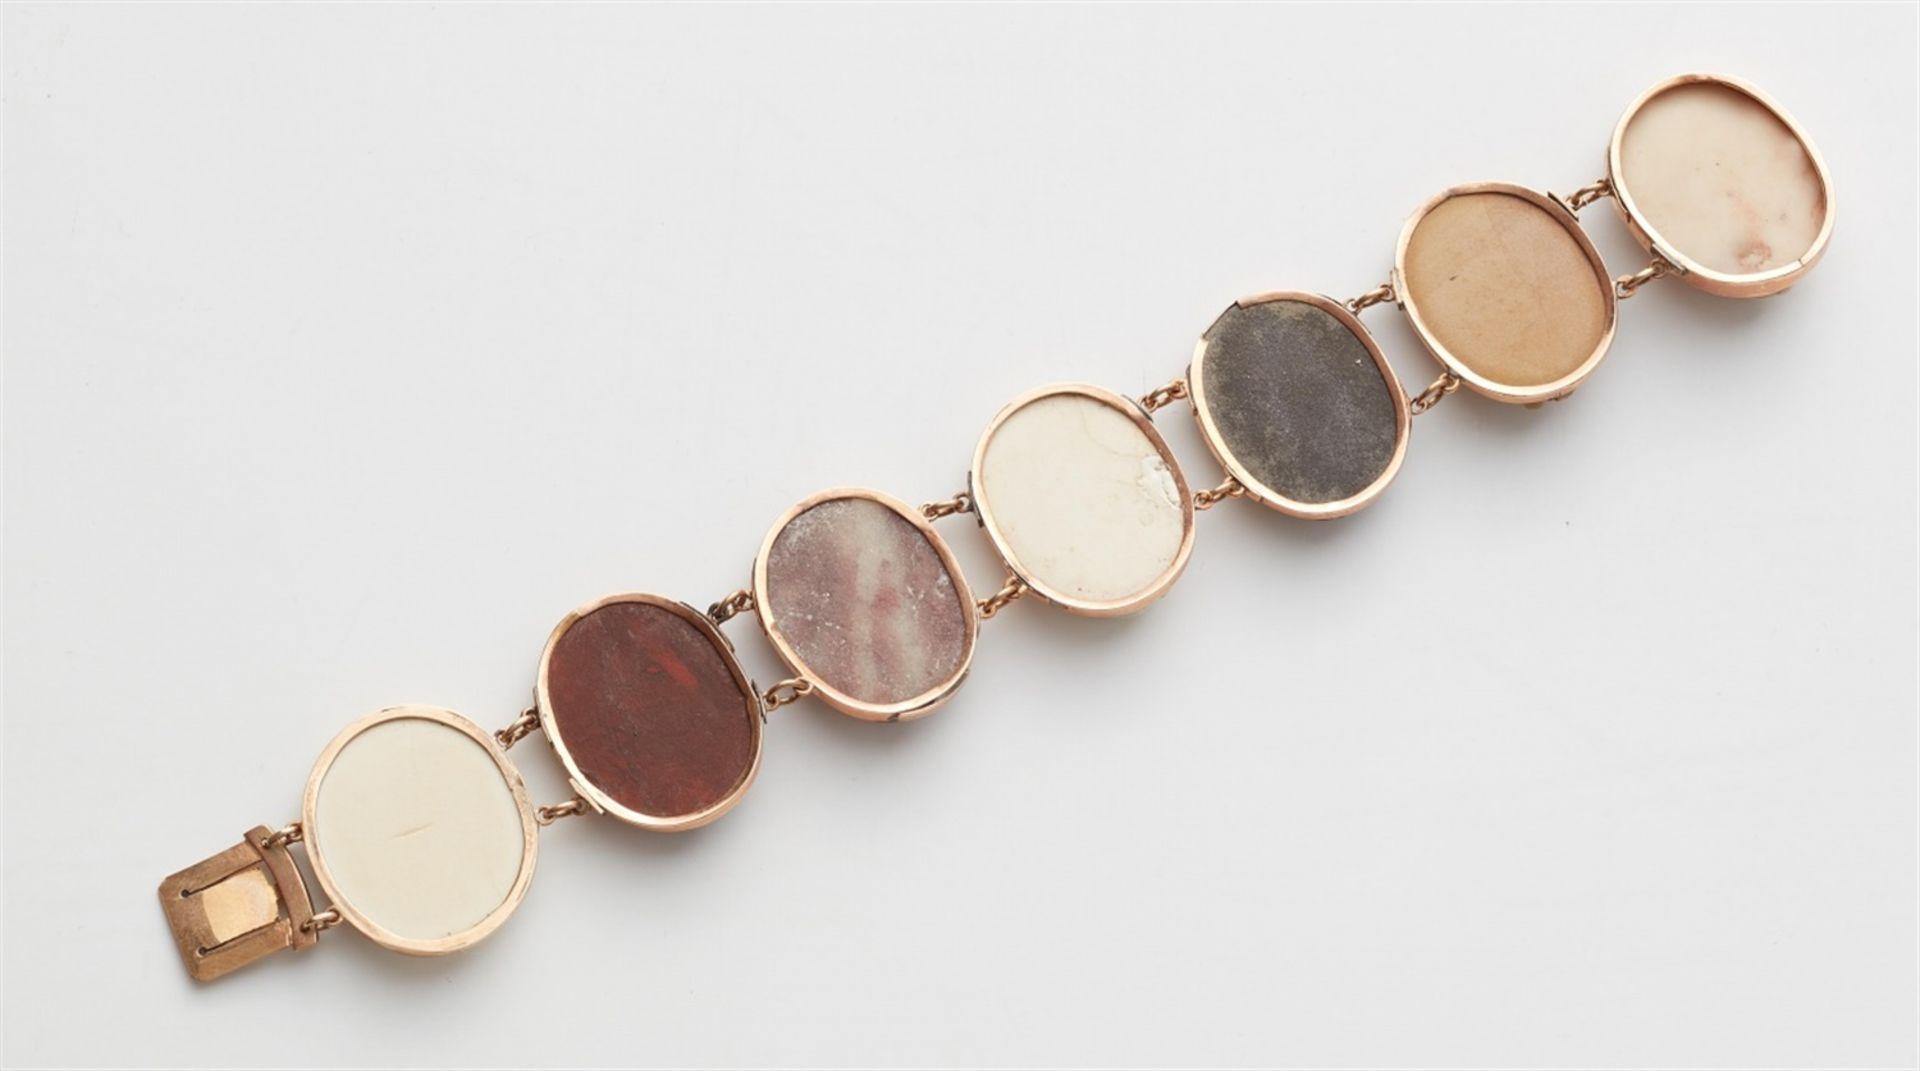 Souvenir-Armband mit Lavakameen - Bild 2 aus 2